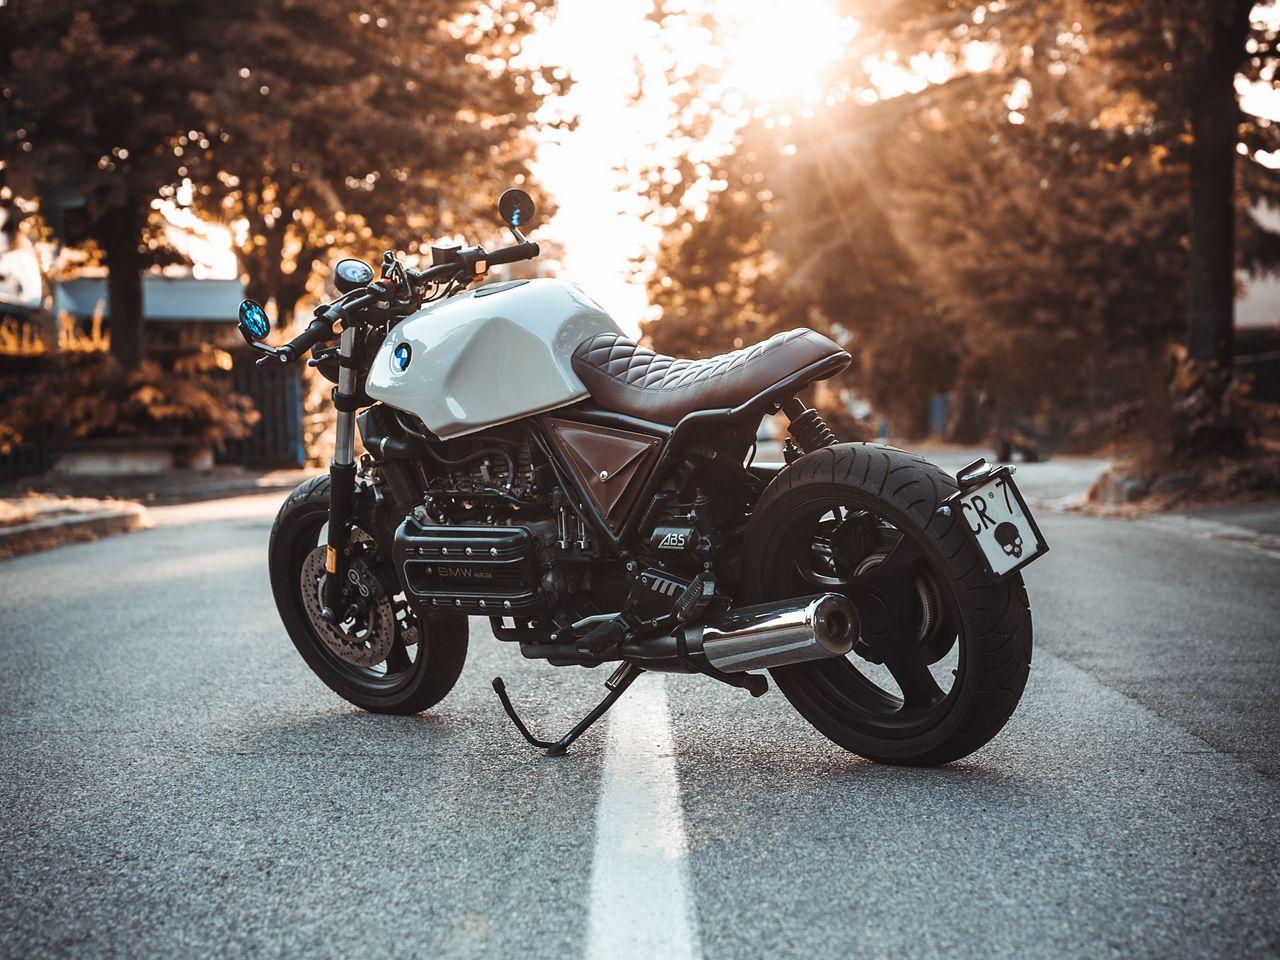 1280x960 Обои bmw k100, мотоцикл, байк, вид сбоку